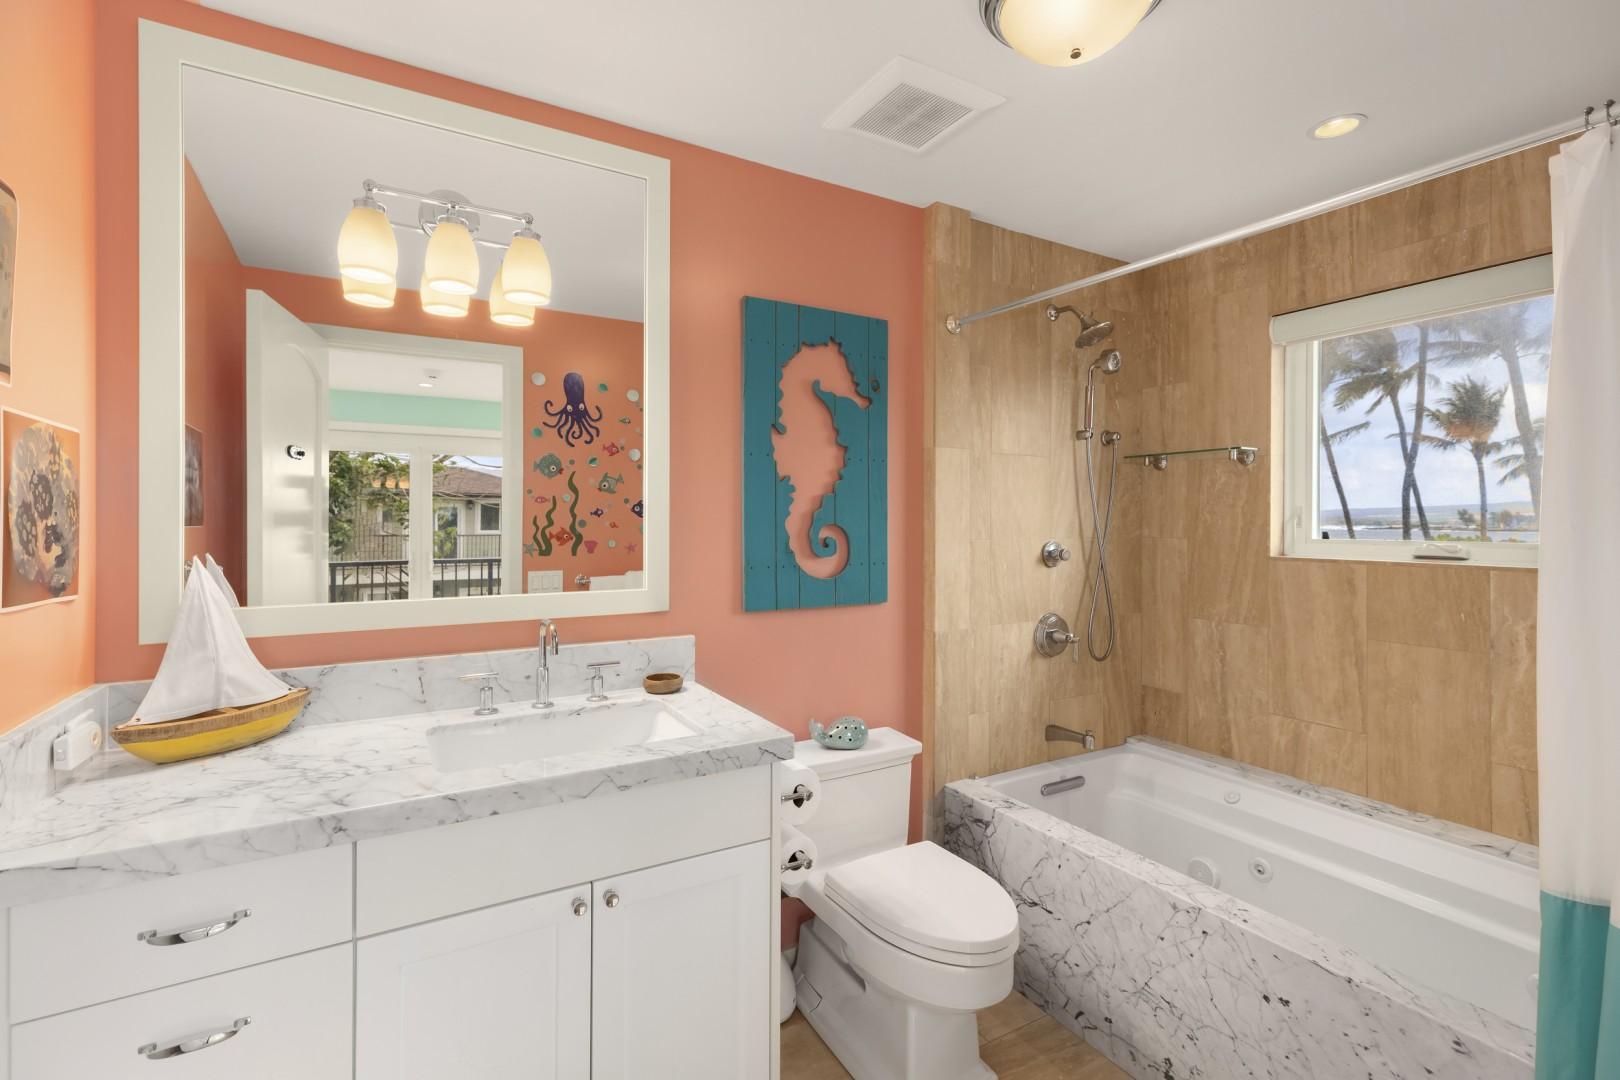 Second-floor bathroom, with whirlpool tub.